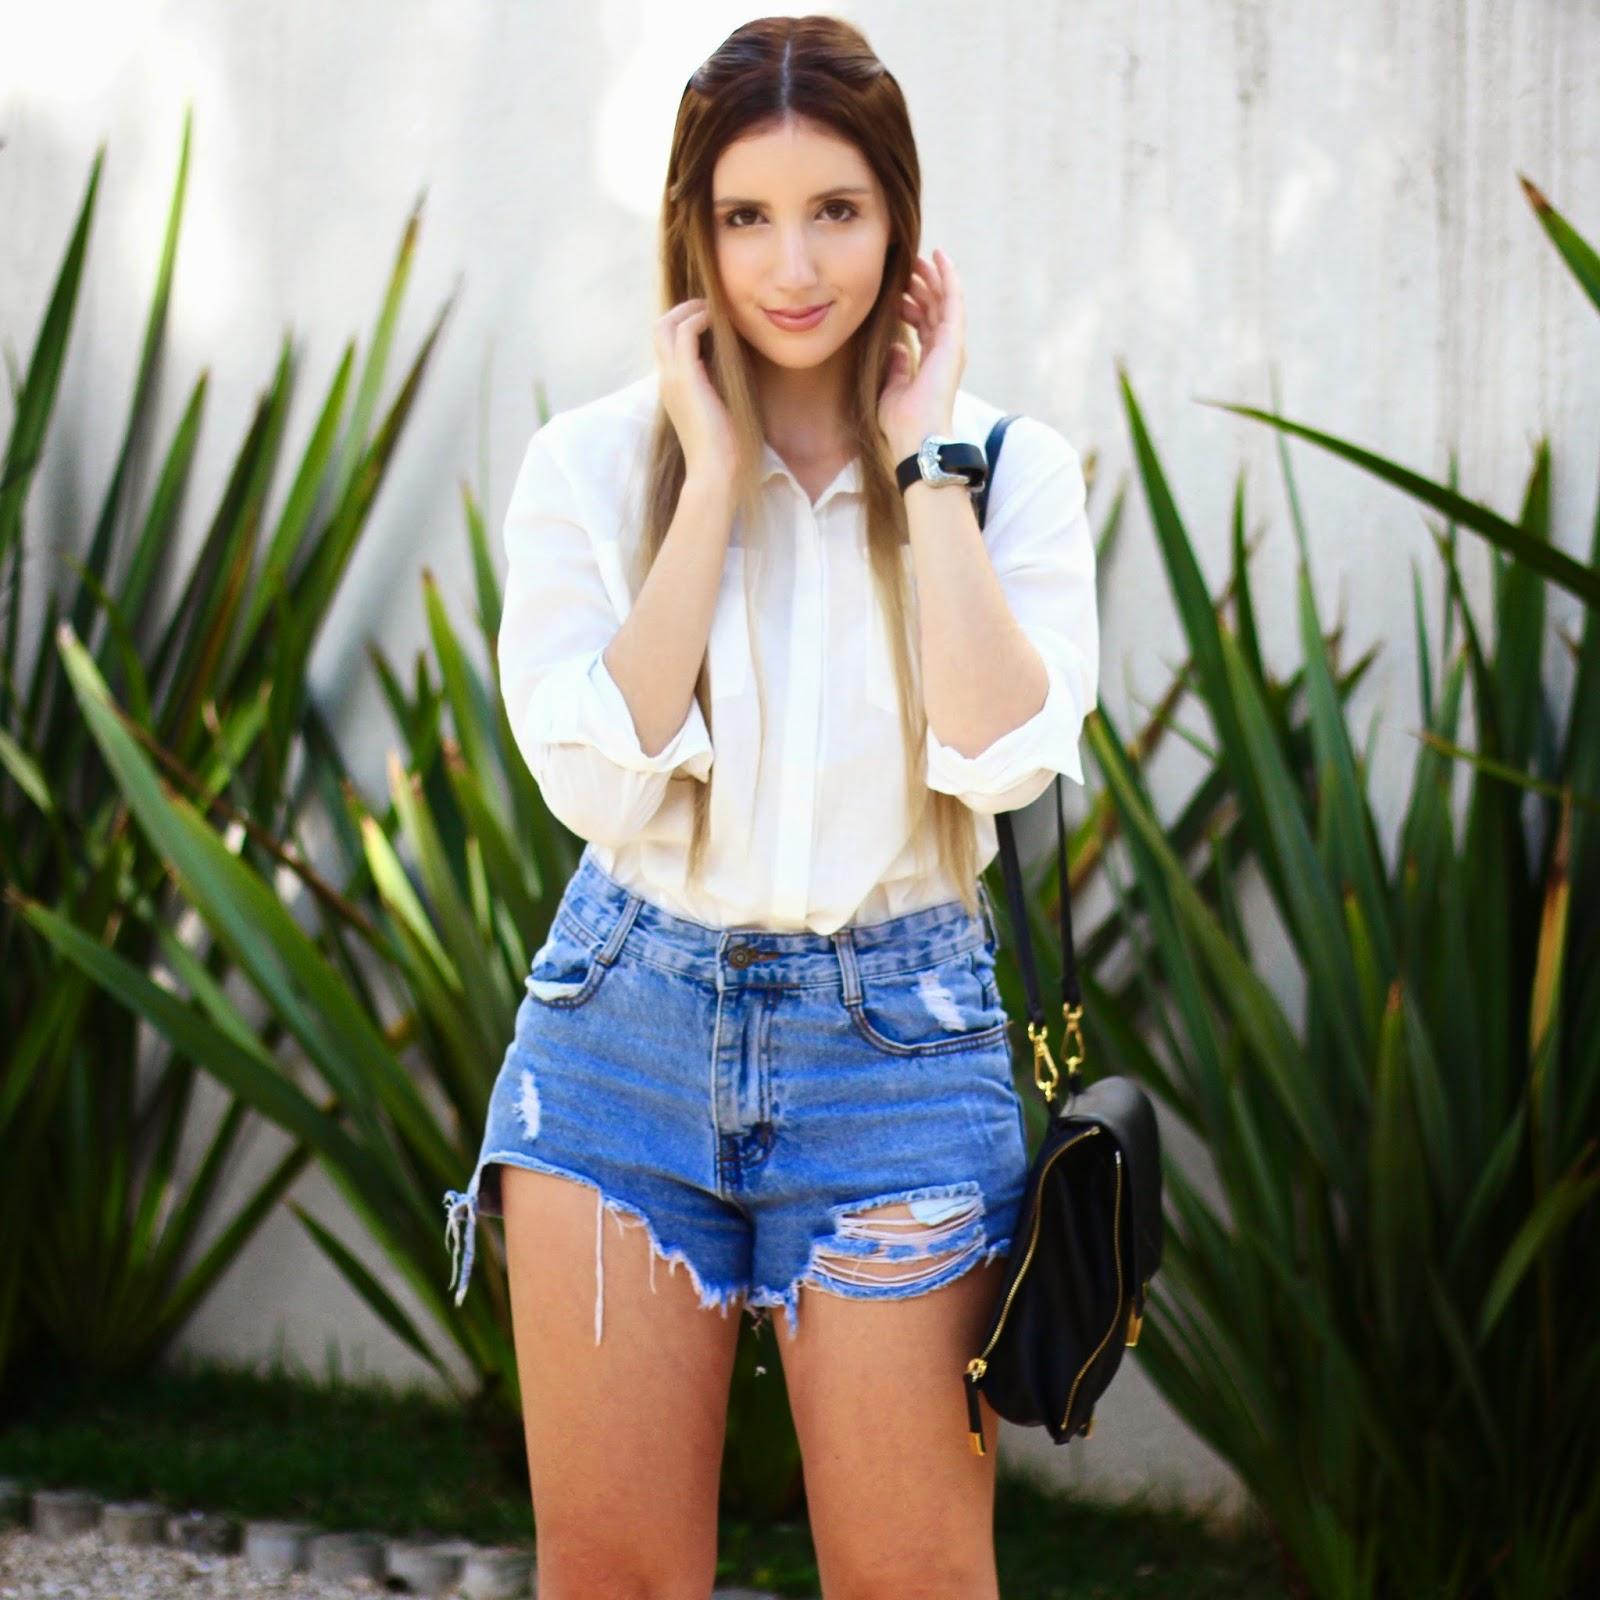 camisa social e shorts jeans